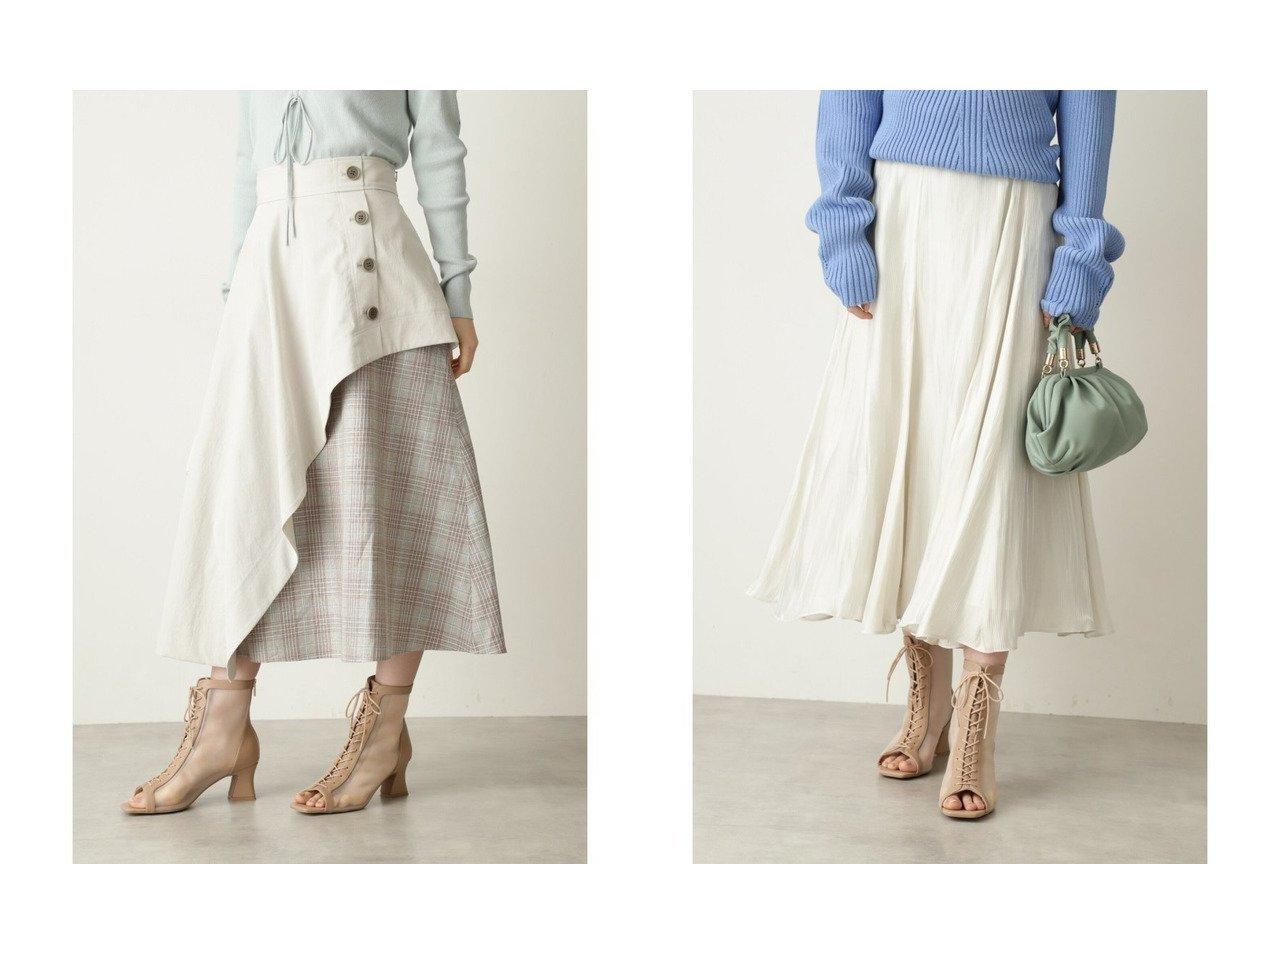 【JILLSTUART/ジルスチュアート】のイザベルスカート&ロビンスカート JILLSTUARTのおすすめ!人気、トレンド・レディースファッションの通販  おすすめで人気の流行・トレンド、ファッションの通販商品 メンズファッション・キッズファッション・インテリア・家具・レディースファッション・服の通販 founy(ファニー) https://founy.com/ ファッション Fashion レディースファッション WOMEN スカート Skirt NEW・新作・新着・新入荷 New Arrivals コンビ チェック フレア ミドル 再入荷 Restock/Back in Stock/Re Arrival |ID:crp329100000017807